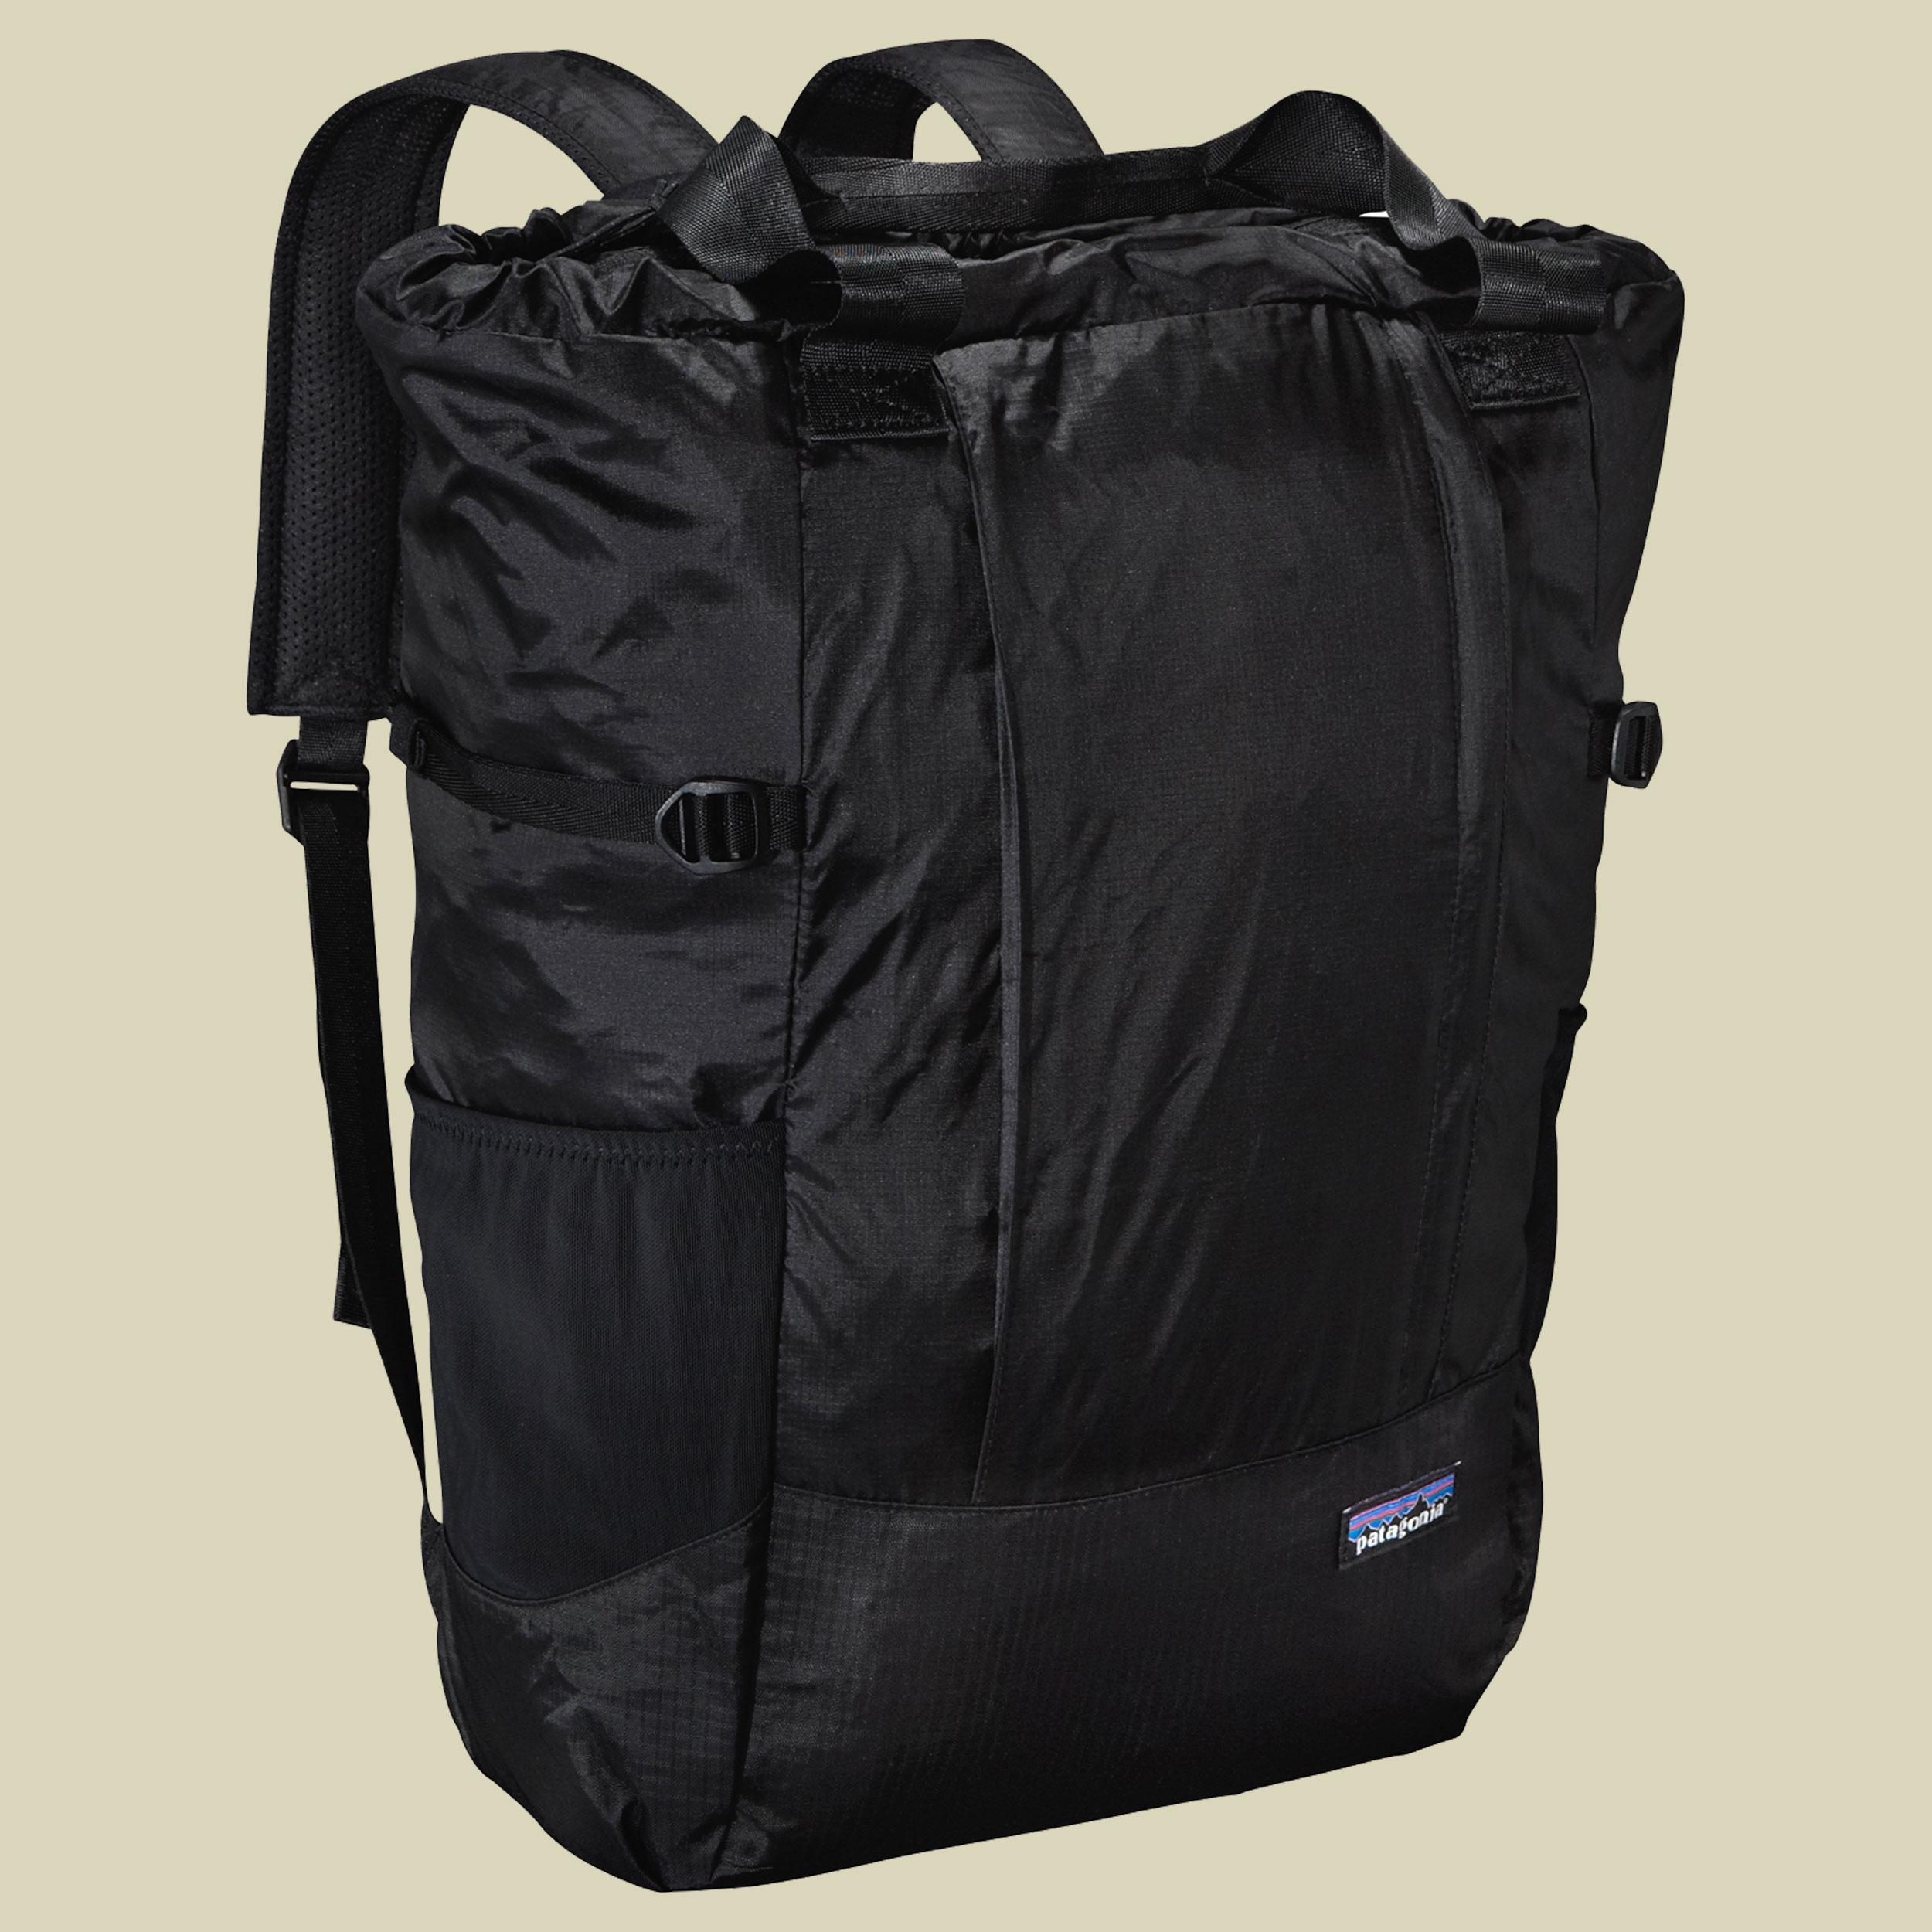 Patagonia, Lightweight Travel Tote Pack, Volumen 22, variable Schultertasche, bl